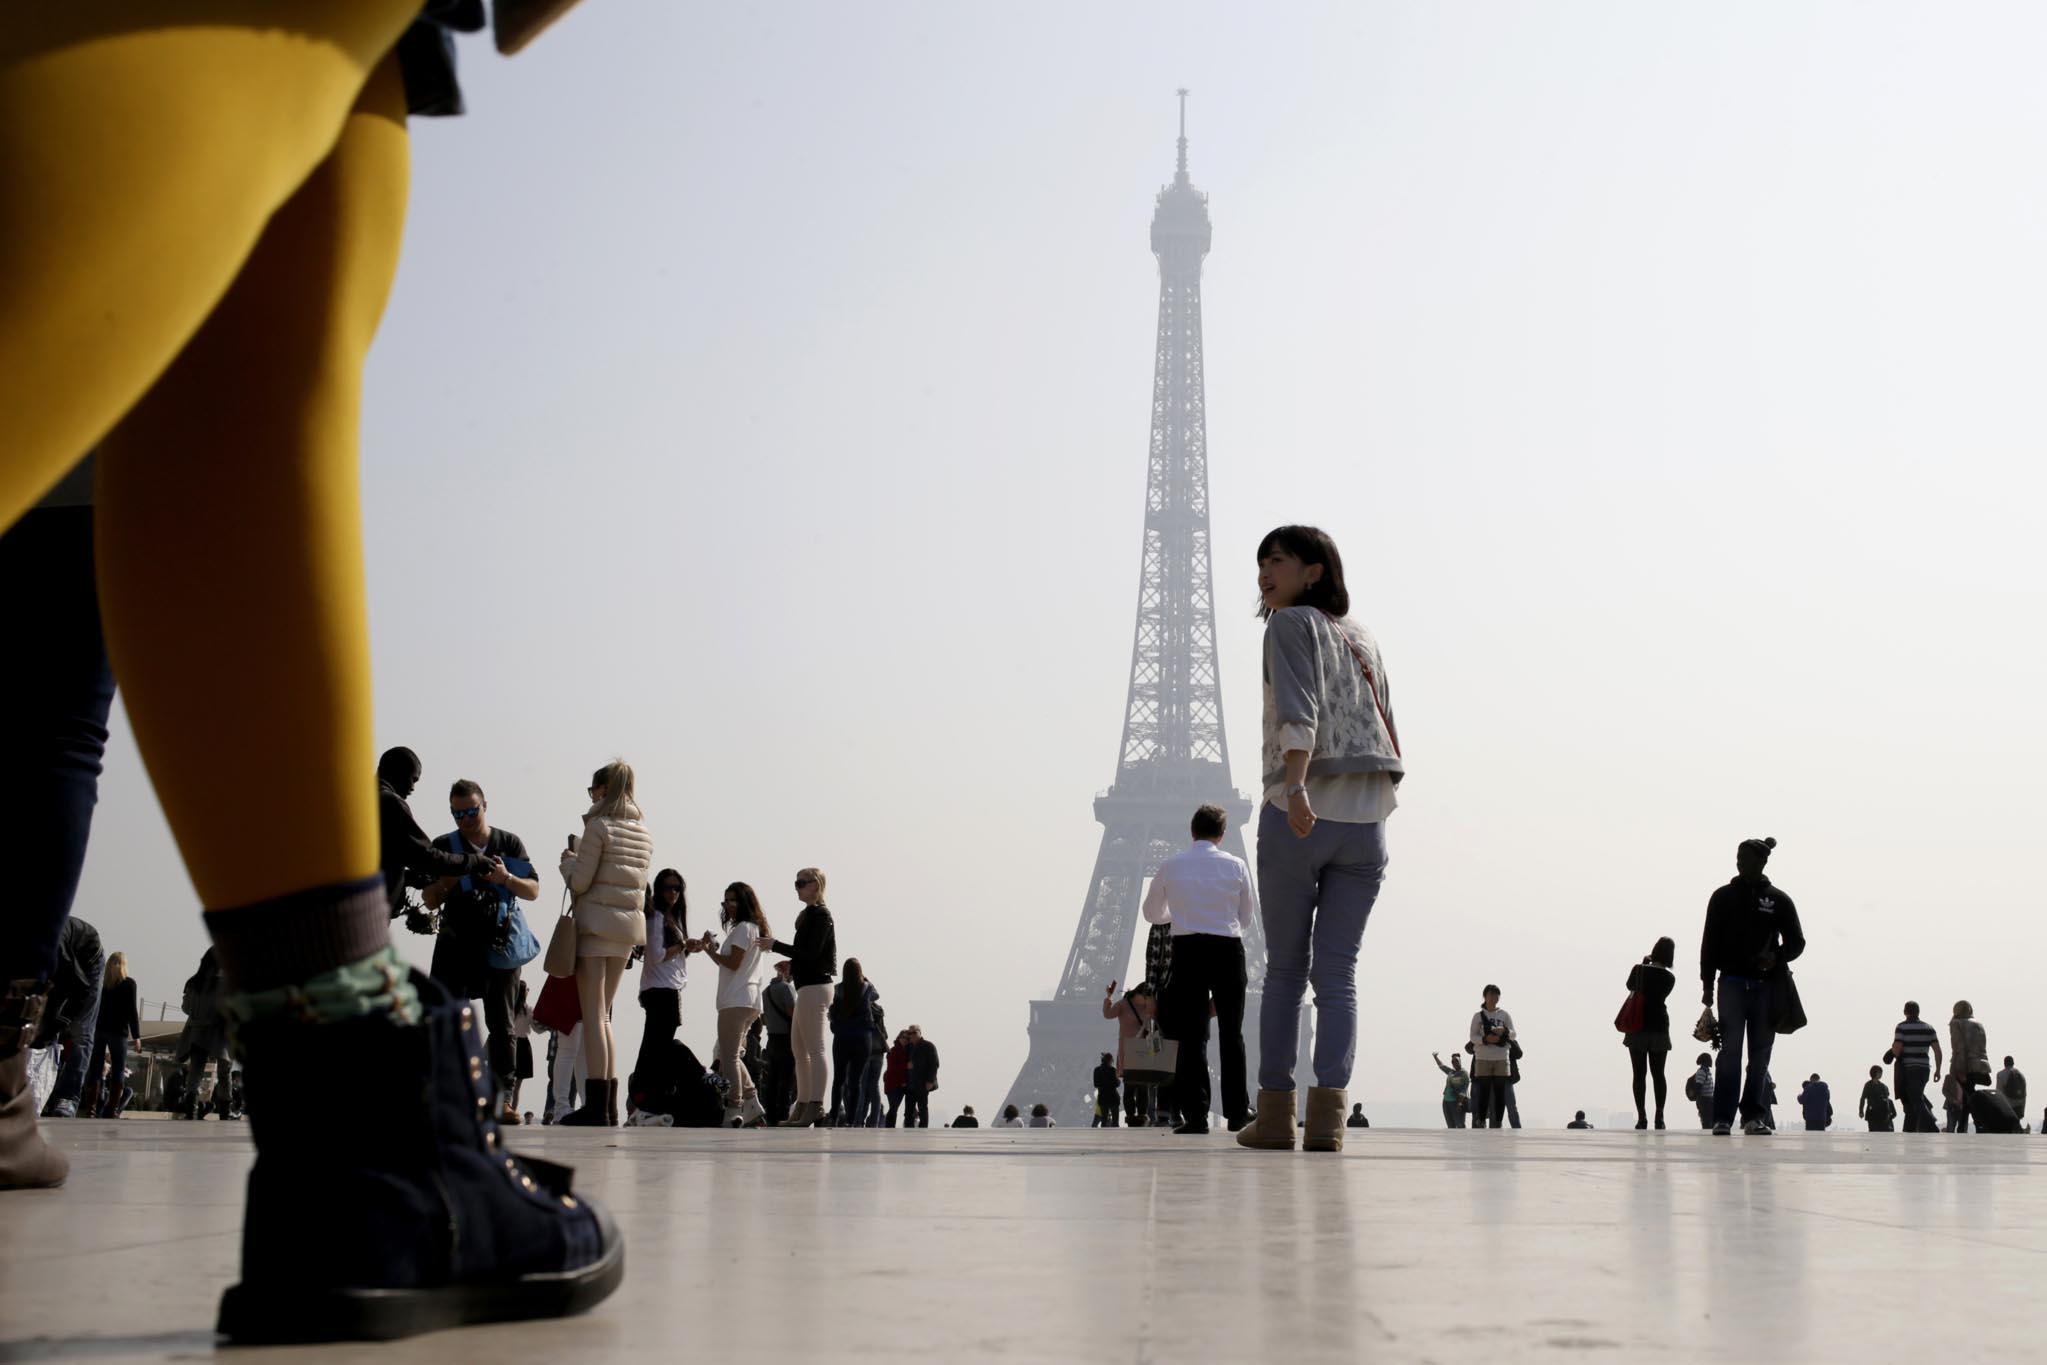 the Eiffel tower in central Paris through a haze of pollution.